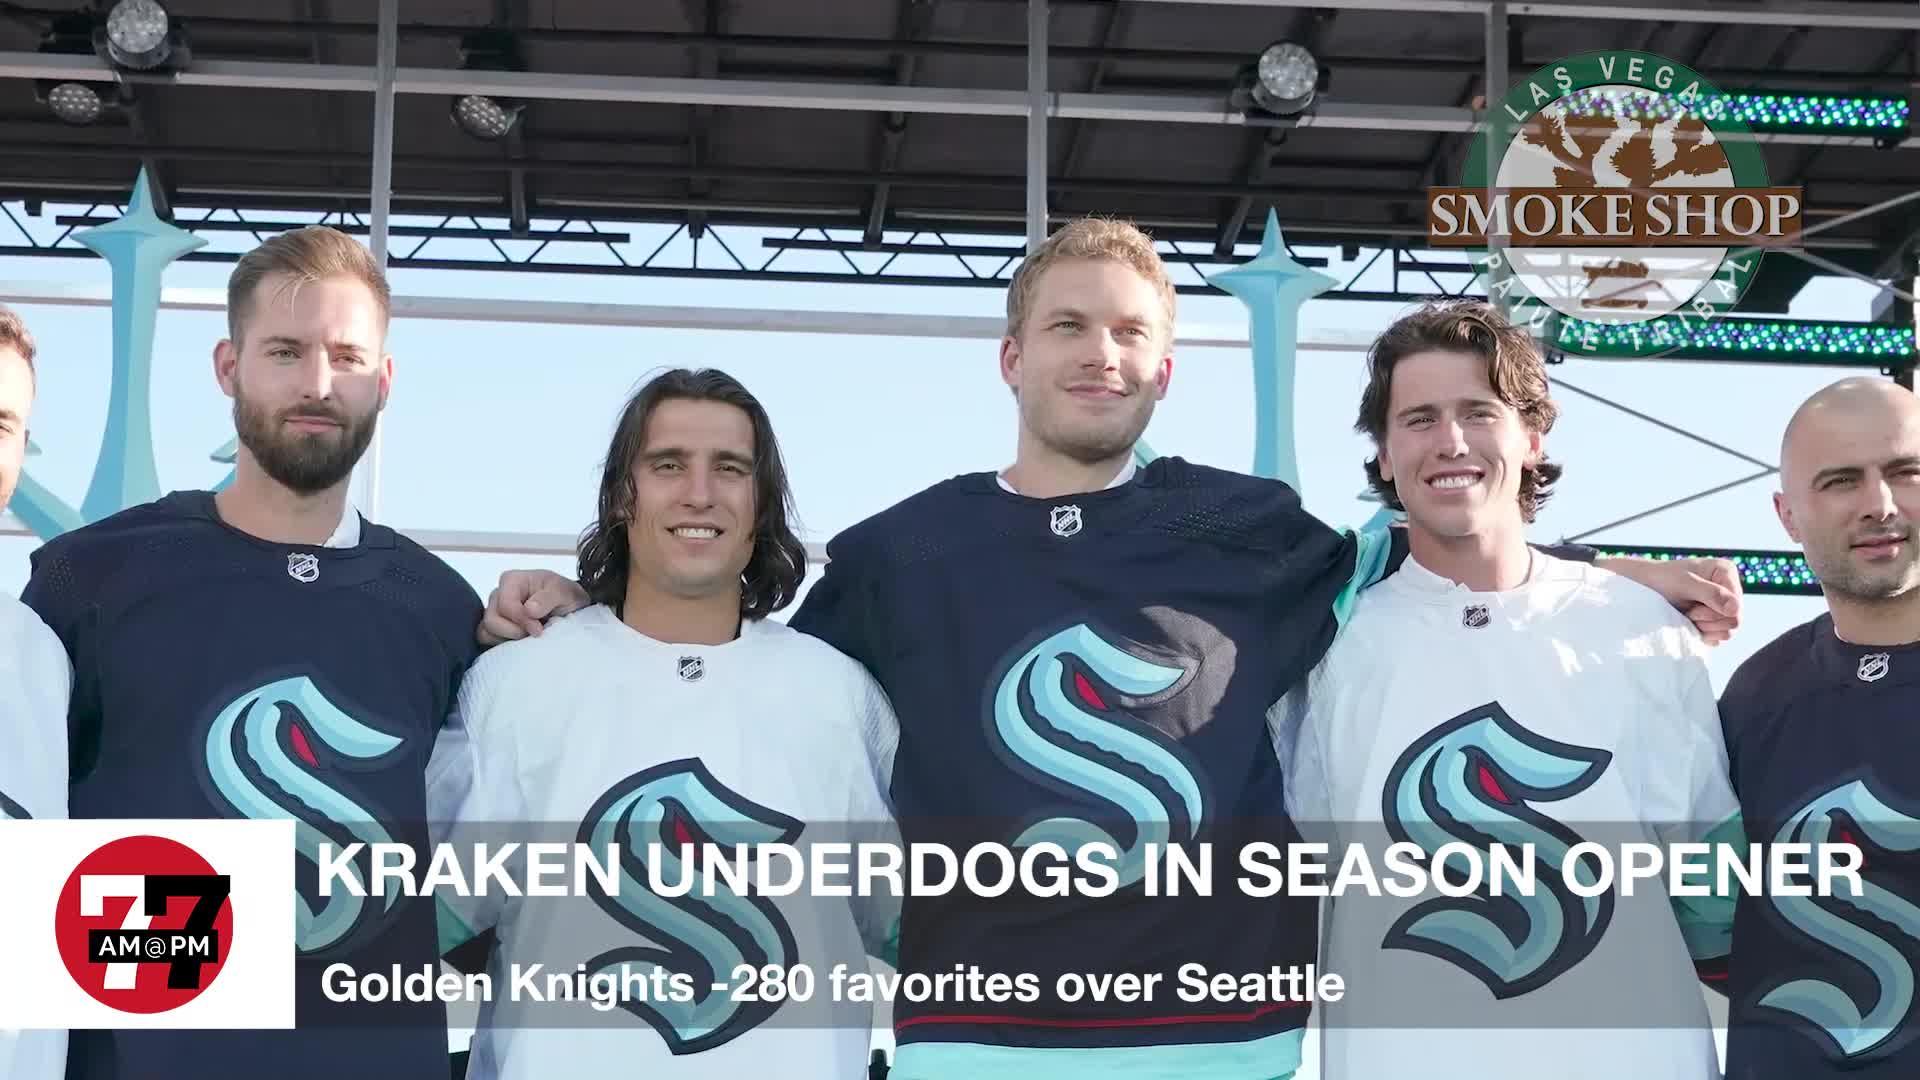 7@7PM Kraken Underdogs in Season Opener